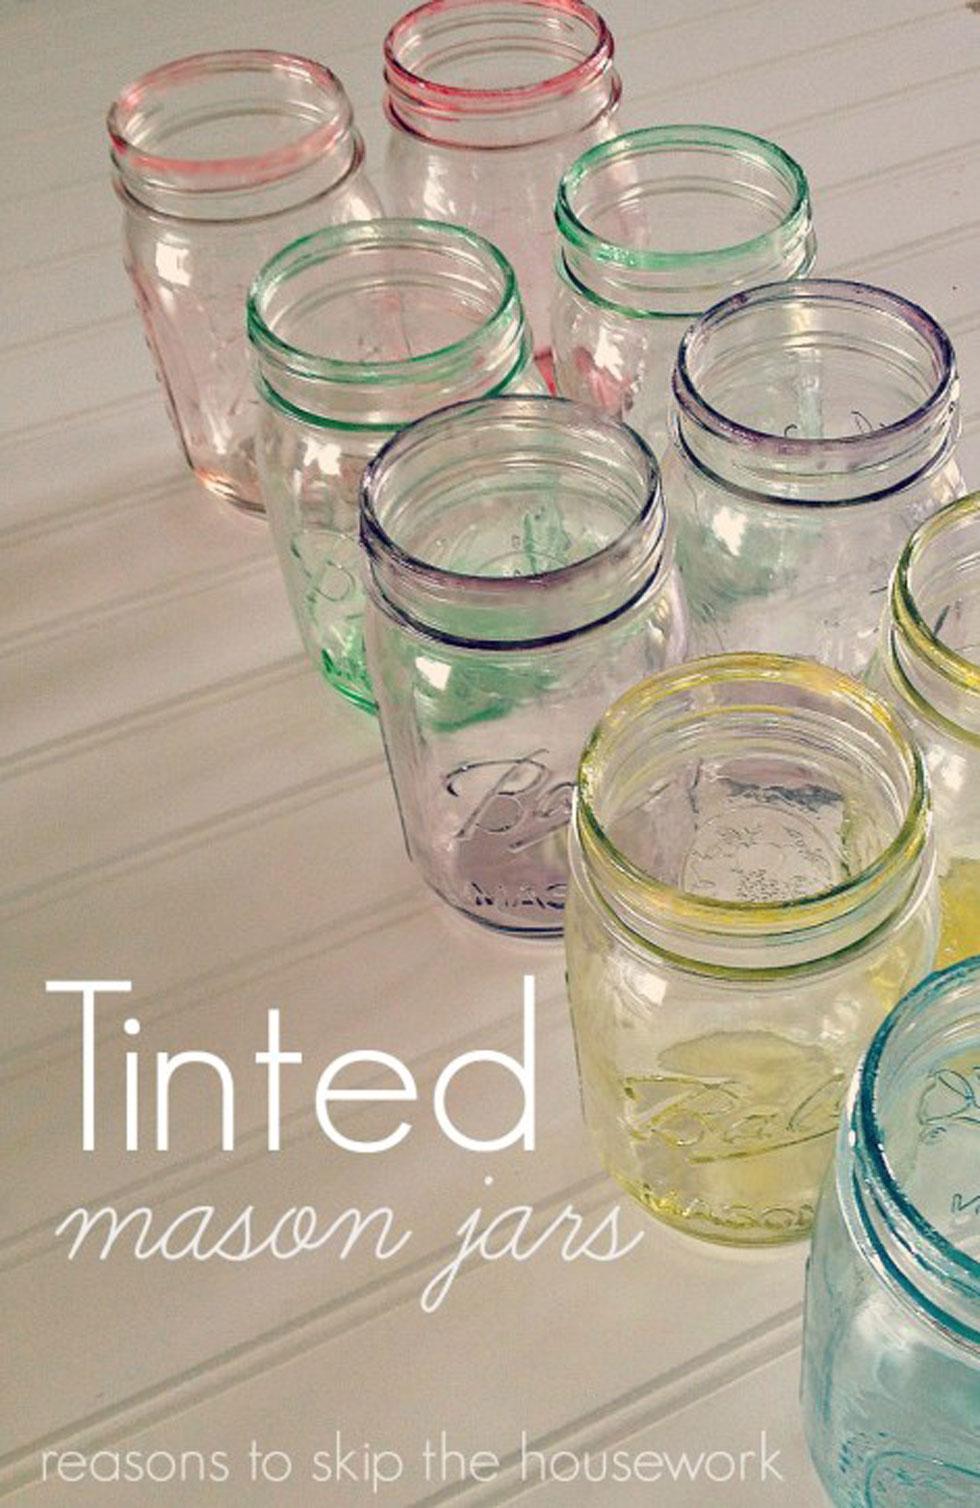 Easter Mason Jars Spring Mason Jar Craft Ideas. 15 Amazing Handmade Mason Jar Organization Ideas That Can Help You